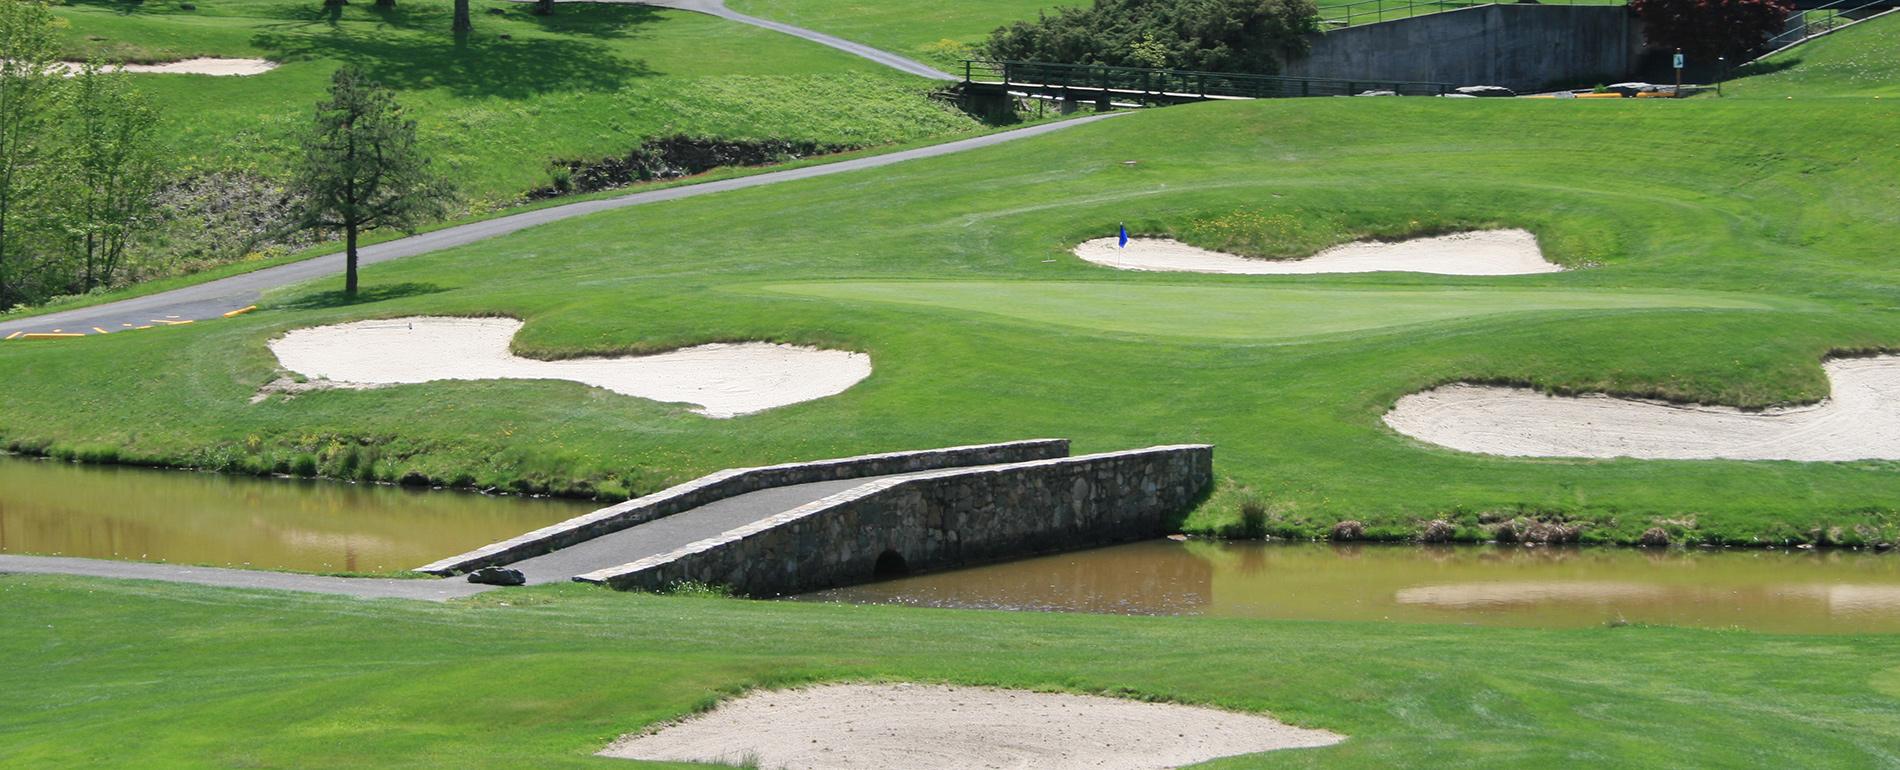 Mount Airy Casino Golf bridge